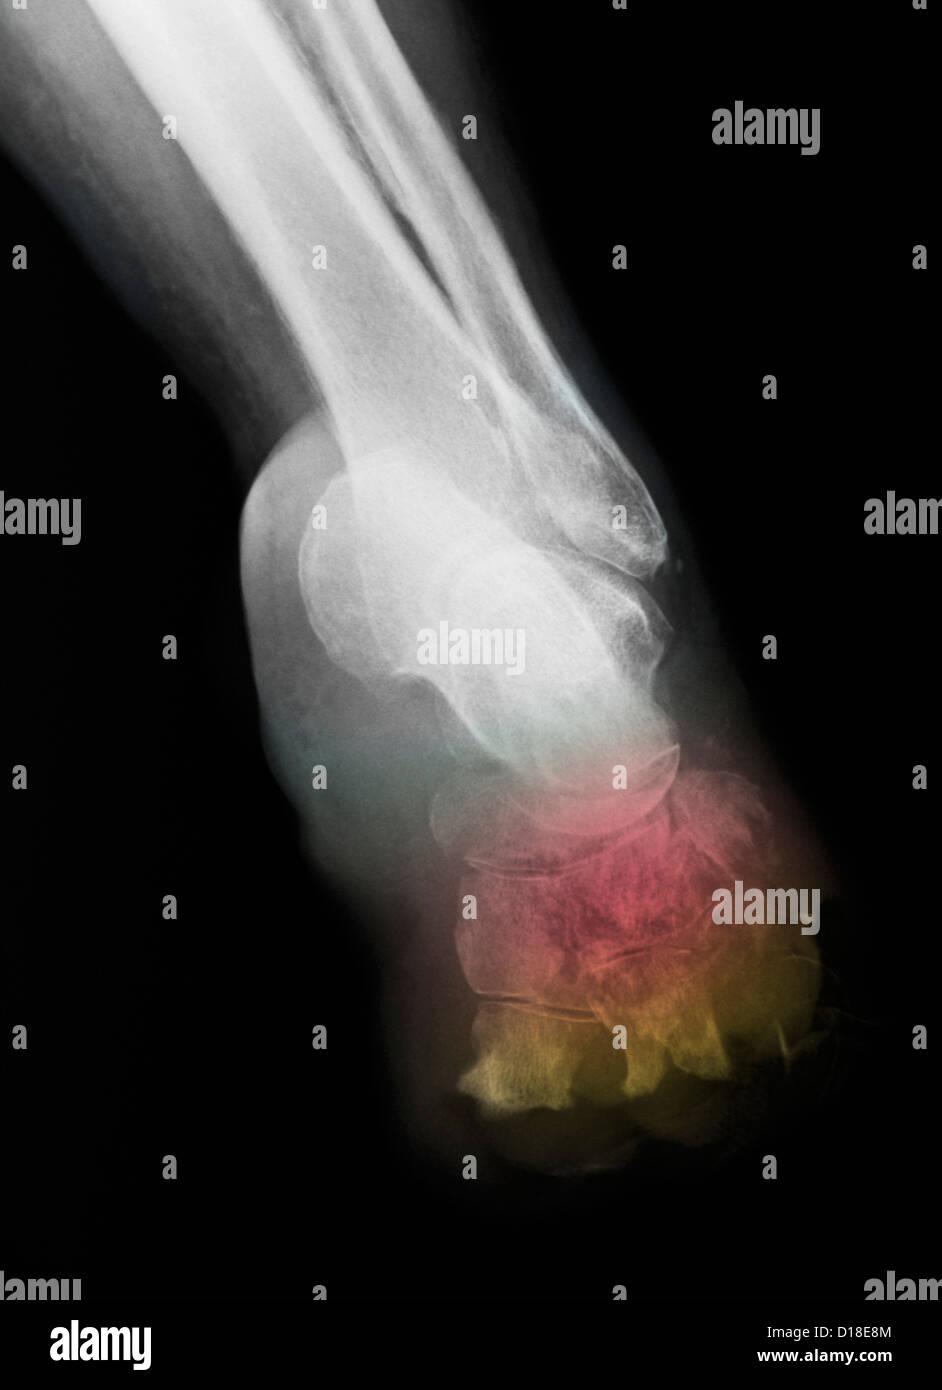 Human Foot Anatomy Stock Photos & Human Foot Anatomy Stock Images ...